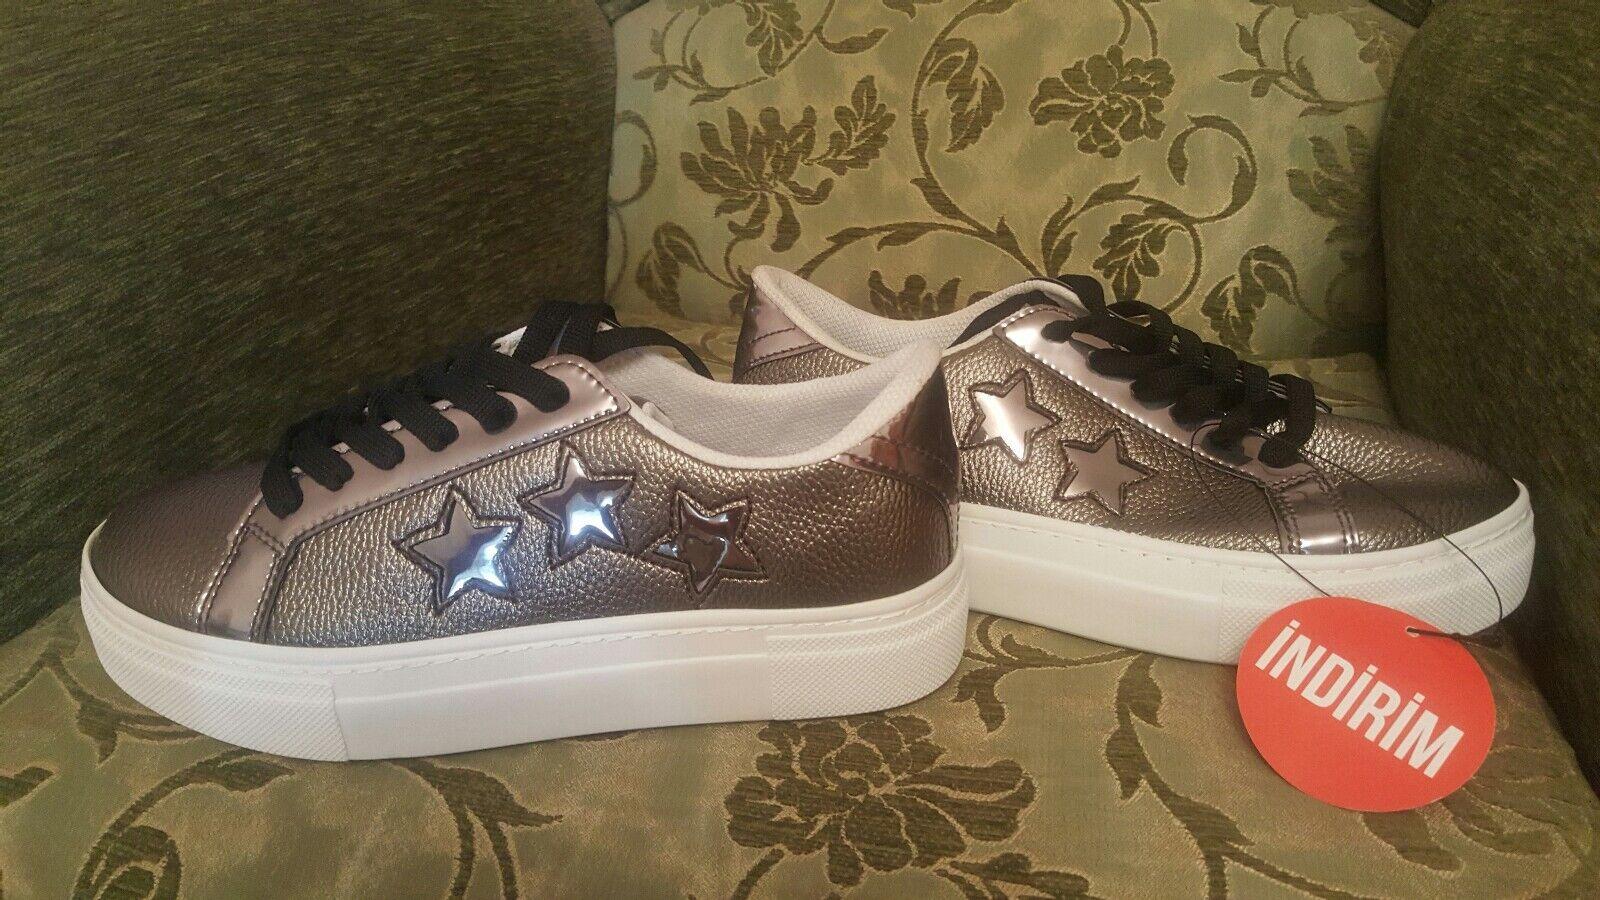 TOP Schuhe METALLIC DESA SNEAKERS SPORT CASUAL FOOTWEAR NEW 37 FITNESS  PLATFORM